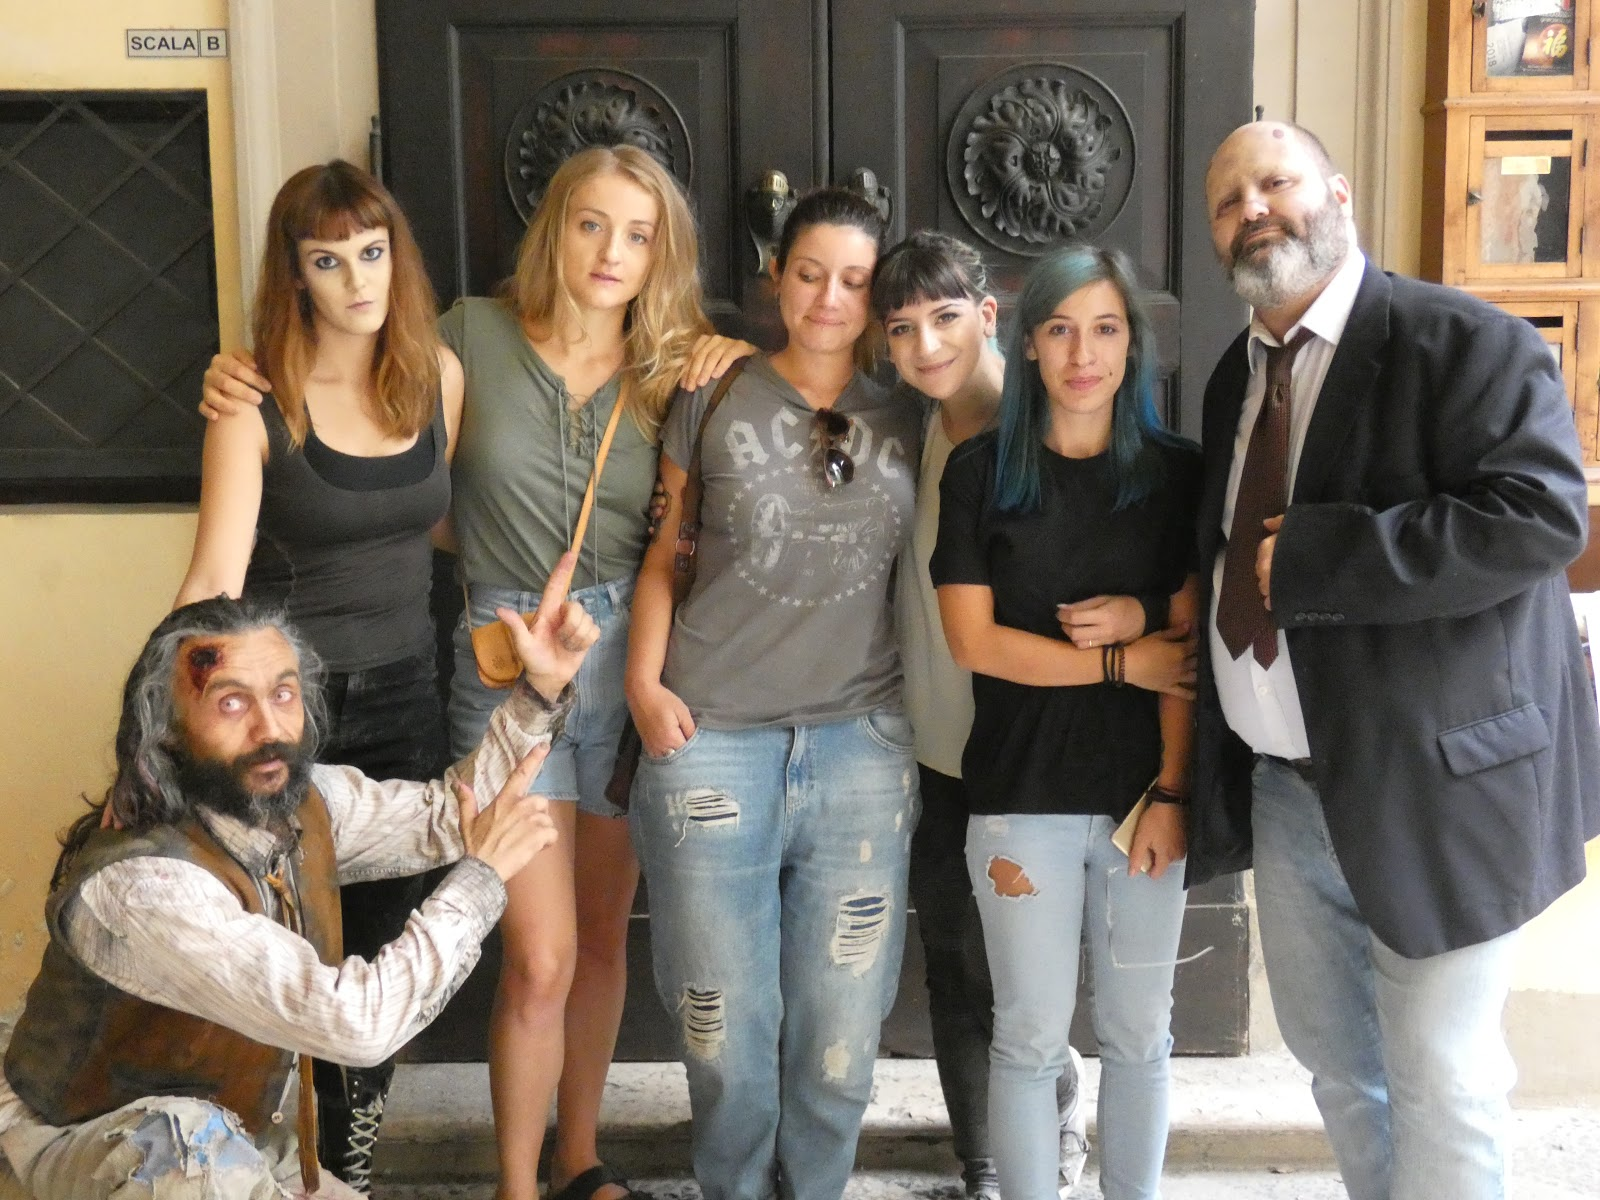 Rudi La Serie Web - Make Up Modena